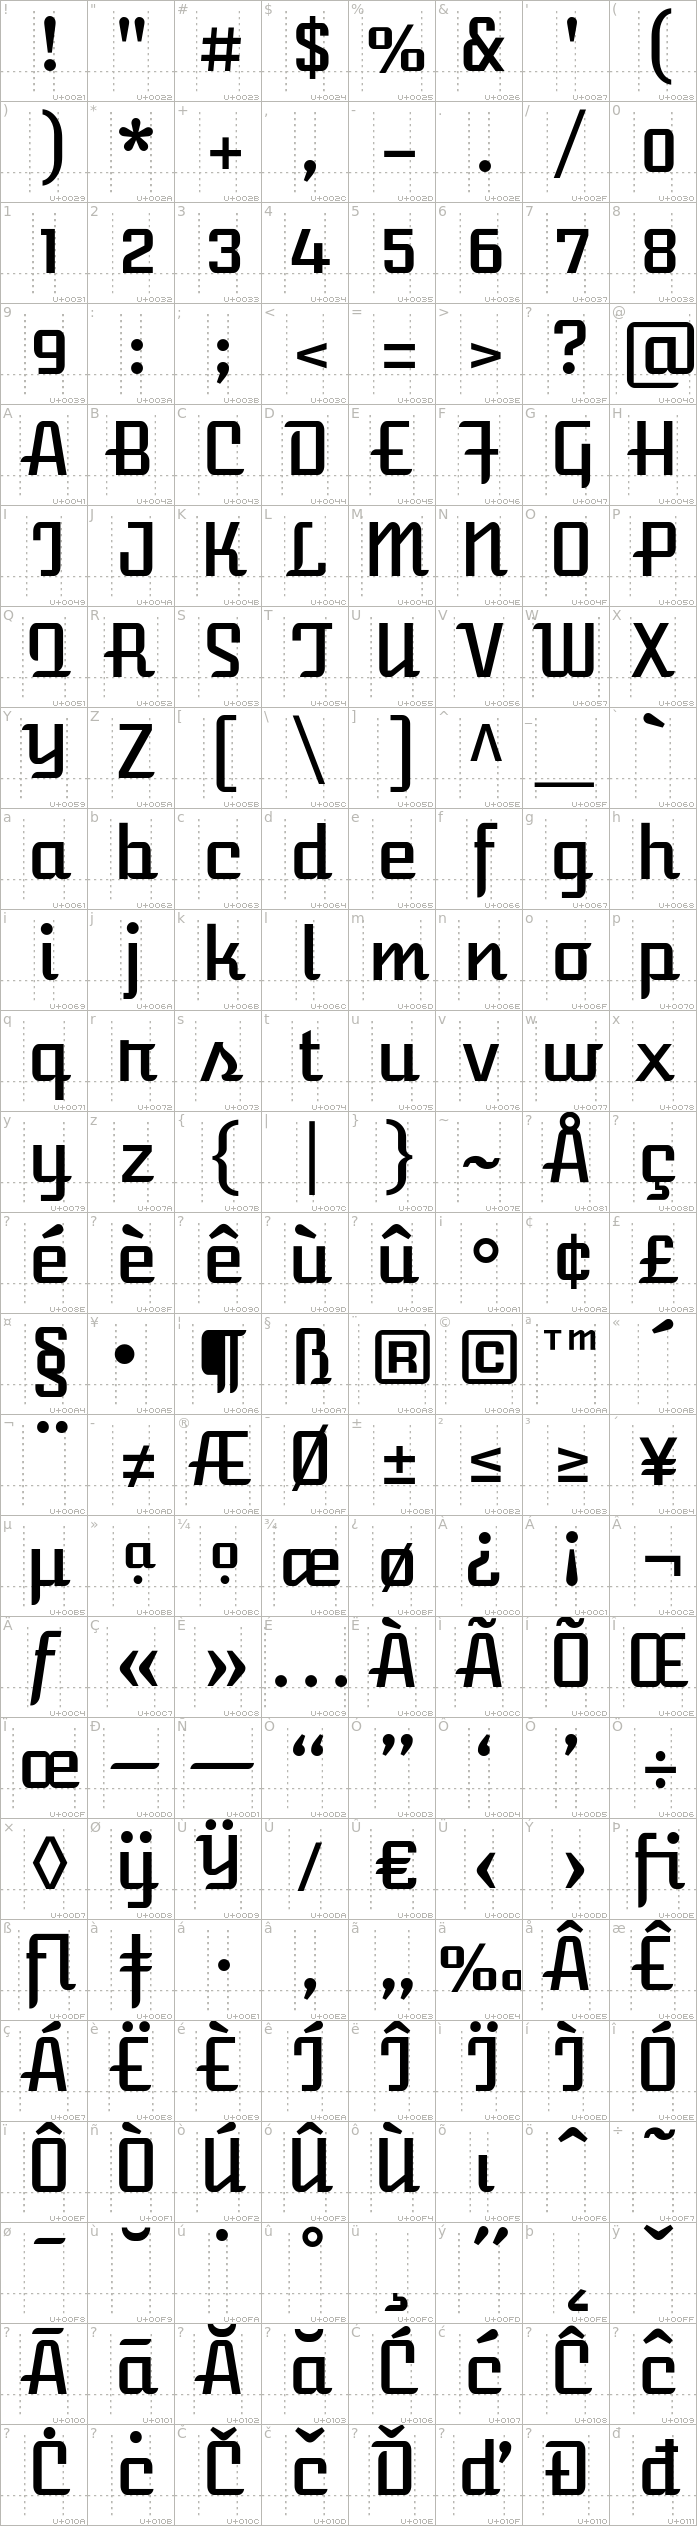 atomic-age.regular.character-map-1